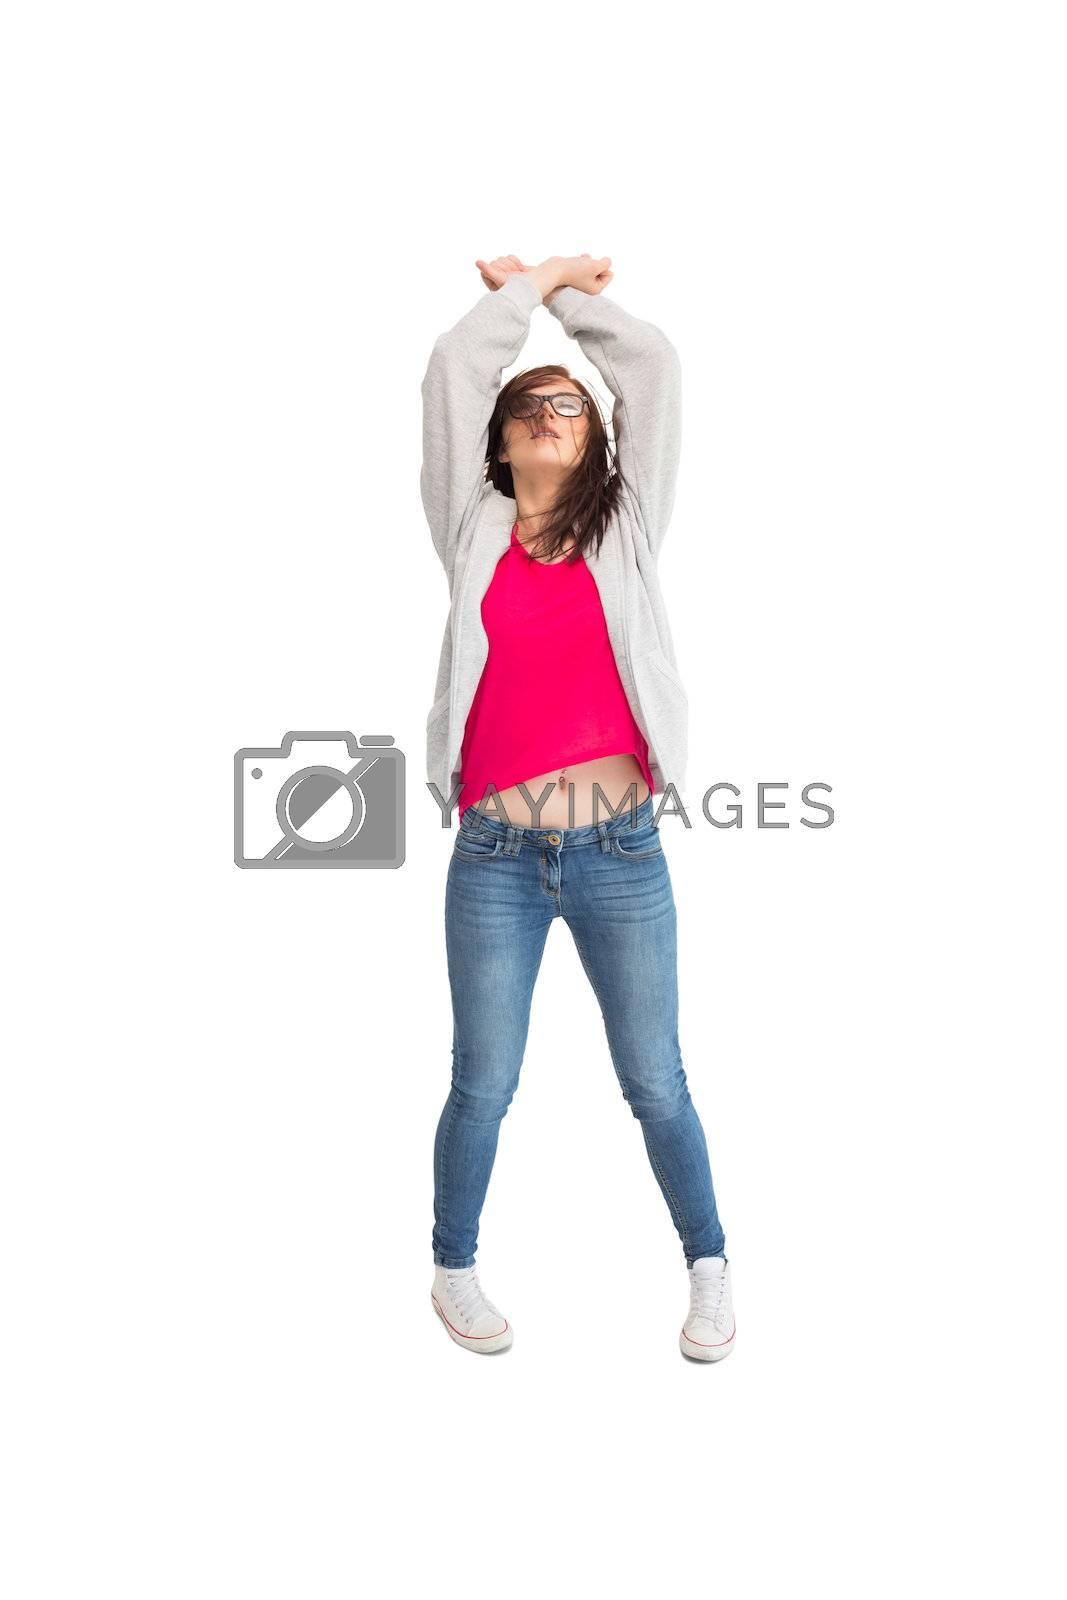 Pretty young woman dancing by Wavebreakmedia